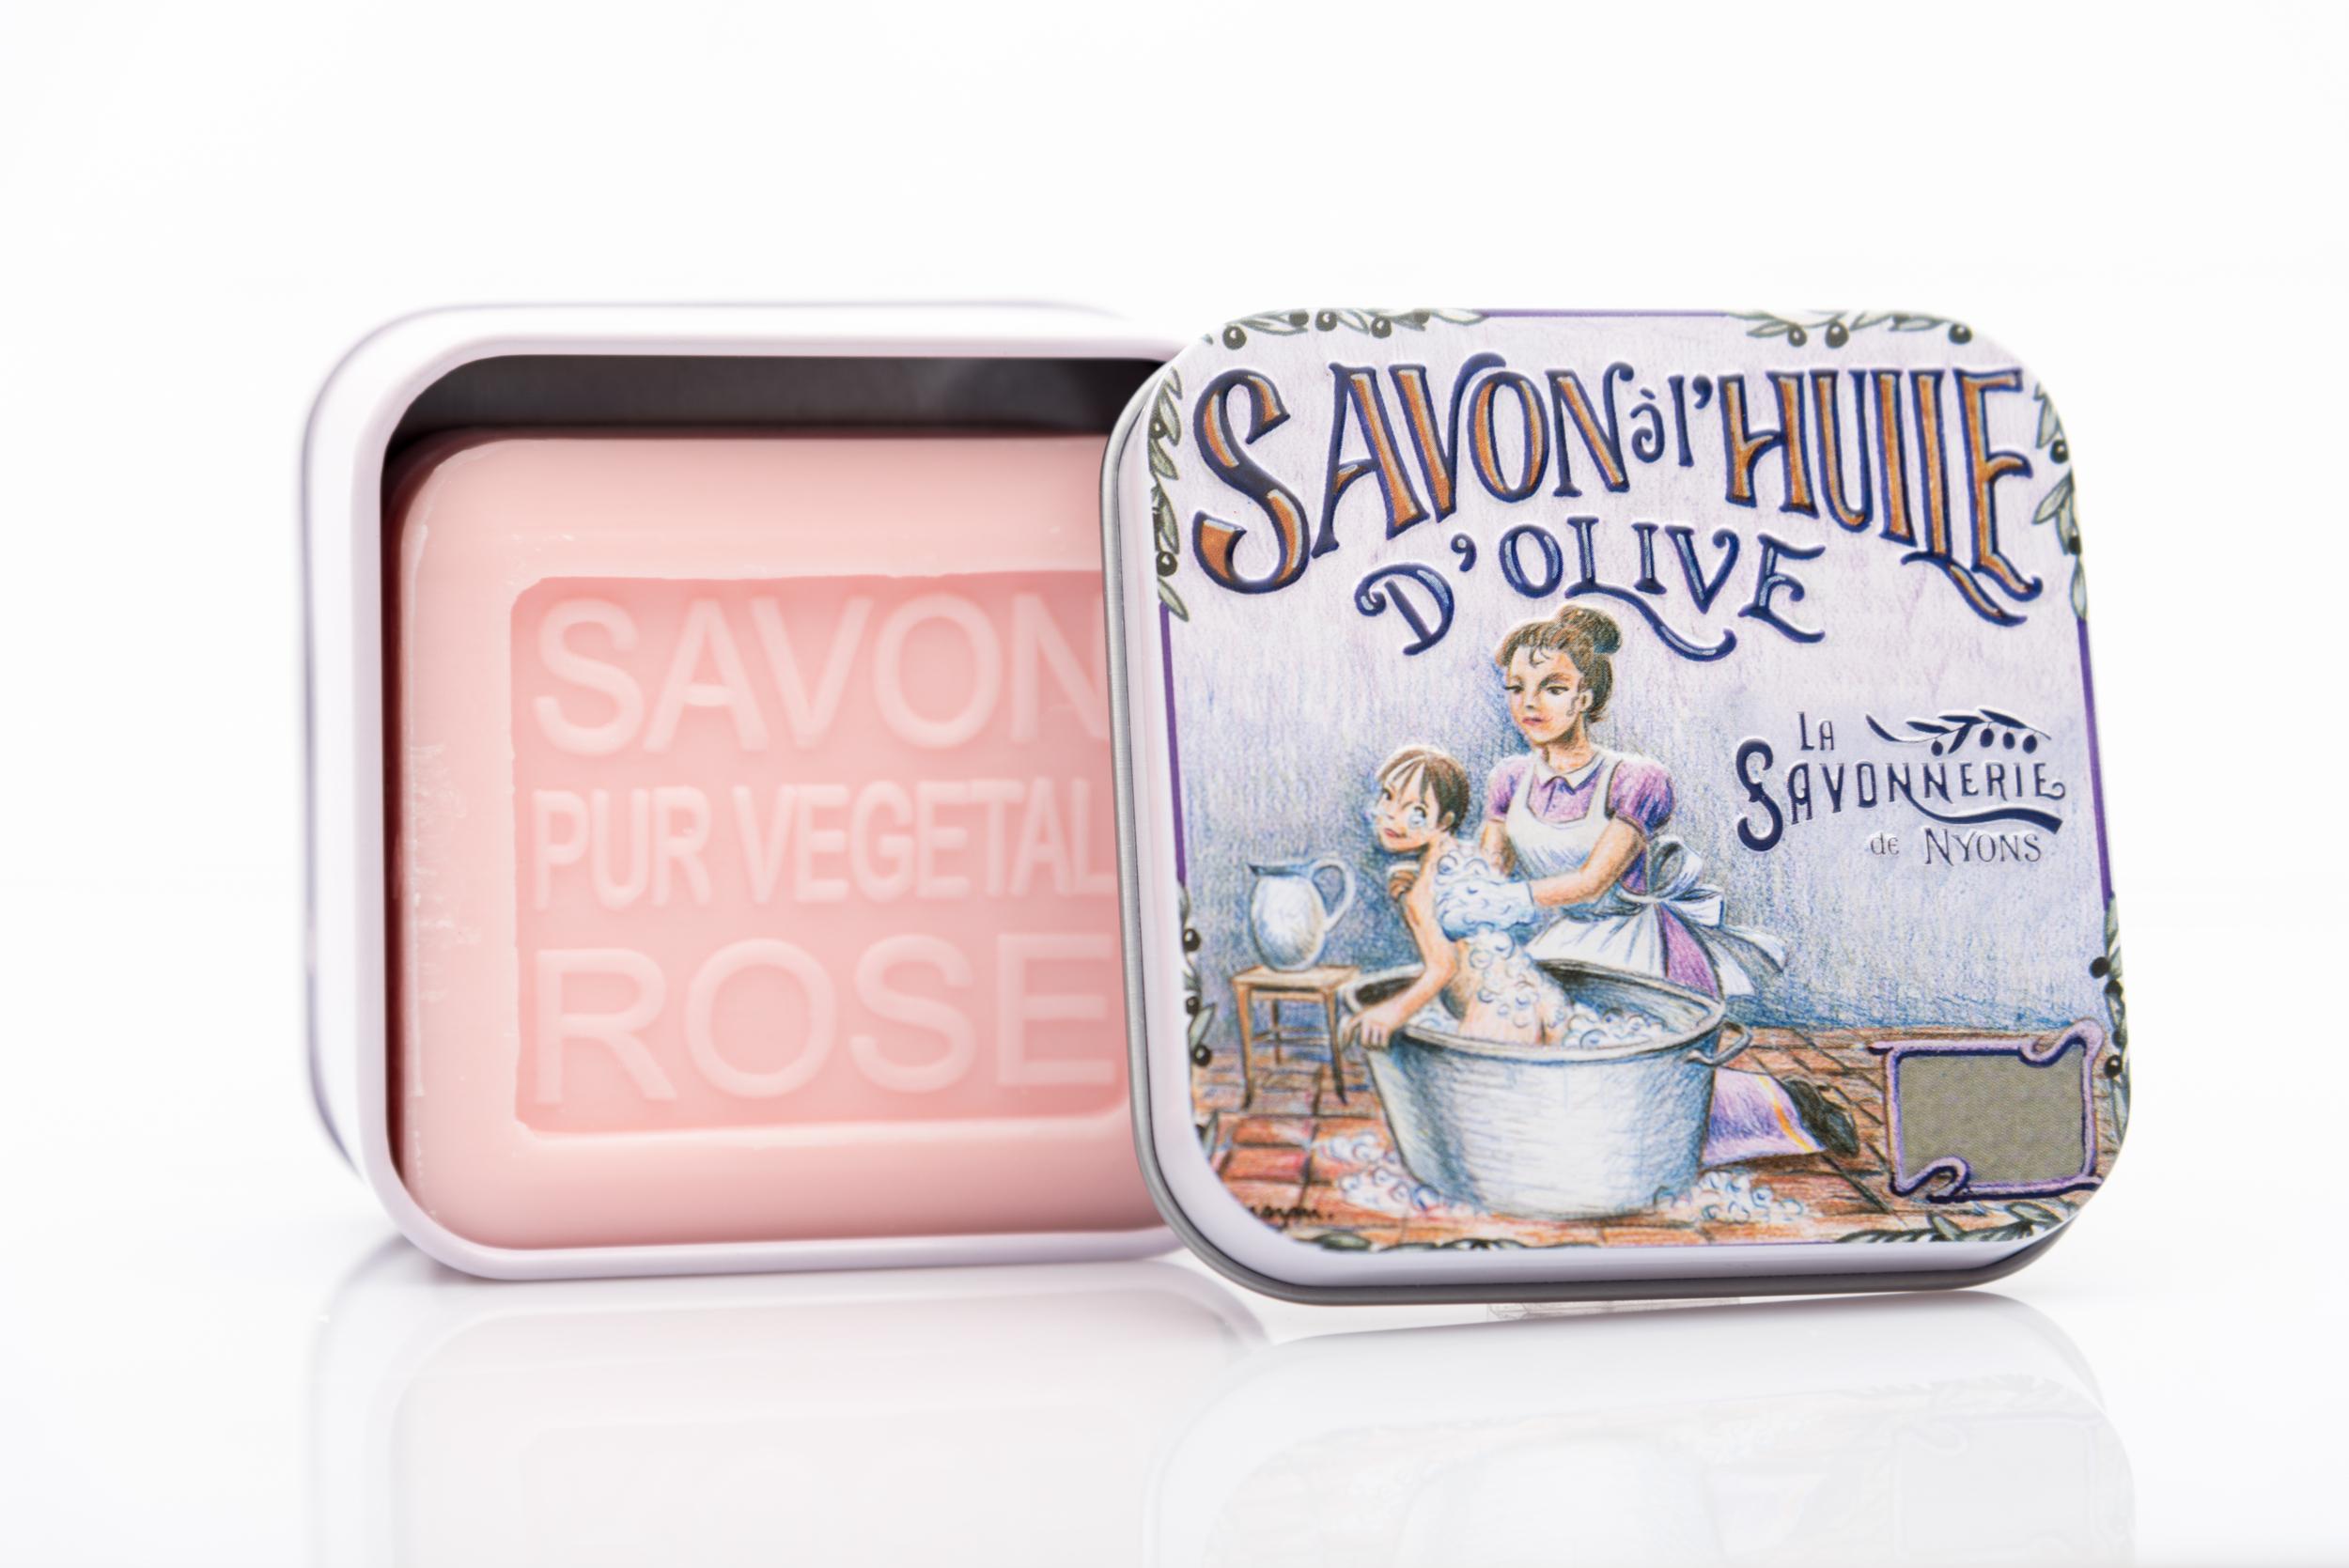 SAVON DE NYONS VEGETAL MADE IN FRANCE AVEC BOITE METALIQUE MODELE 7 A LA ROSE